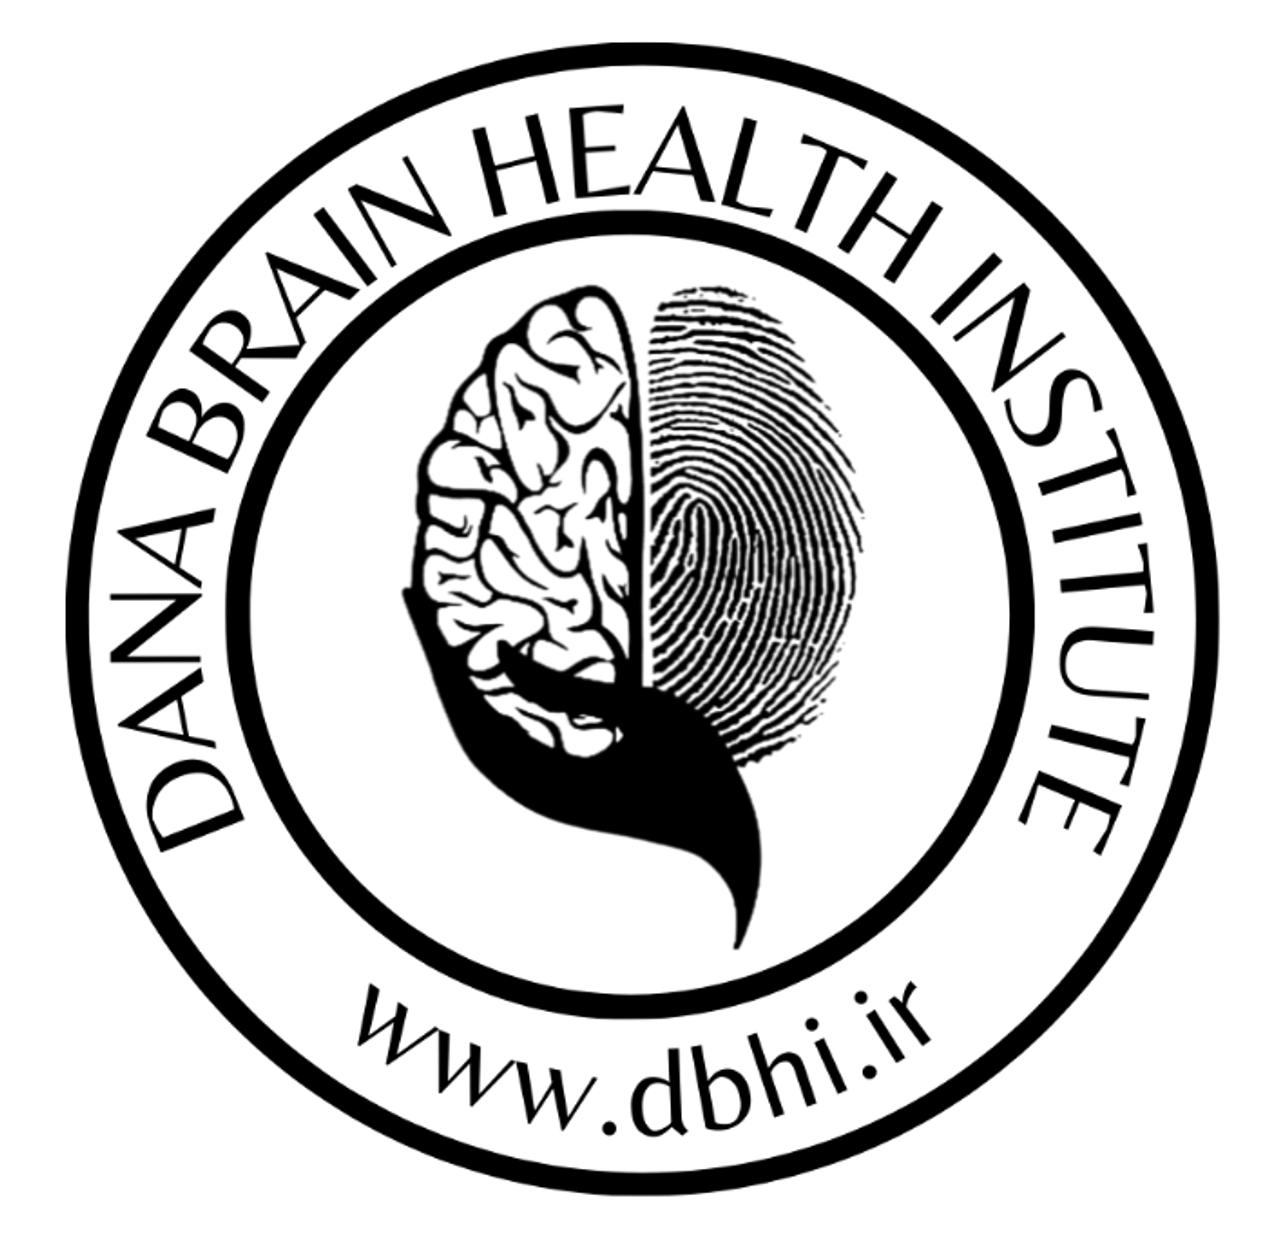 DANA BRAIN HEALTH INSTITUTE